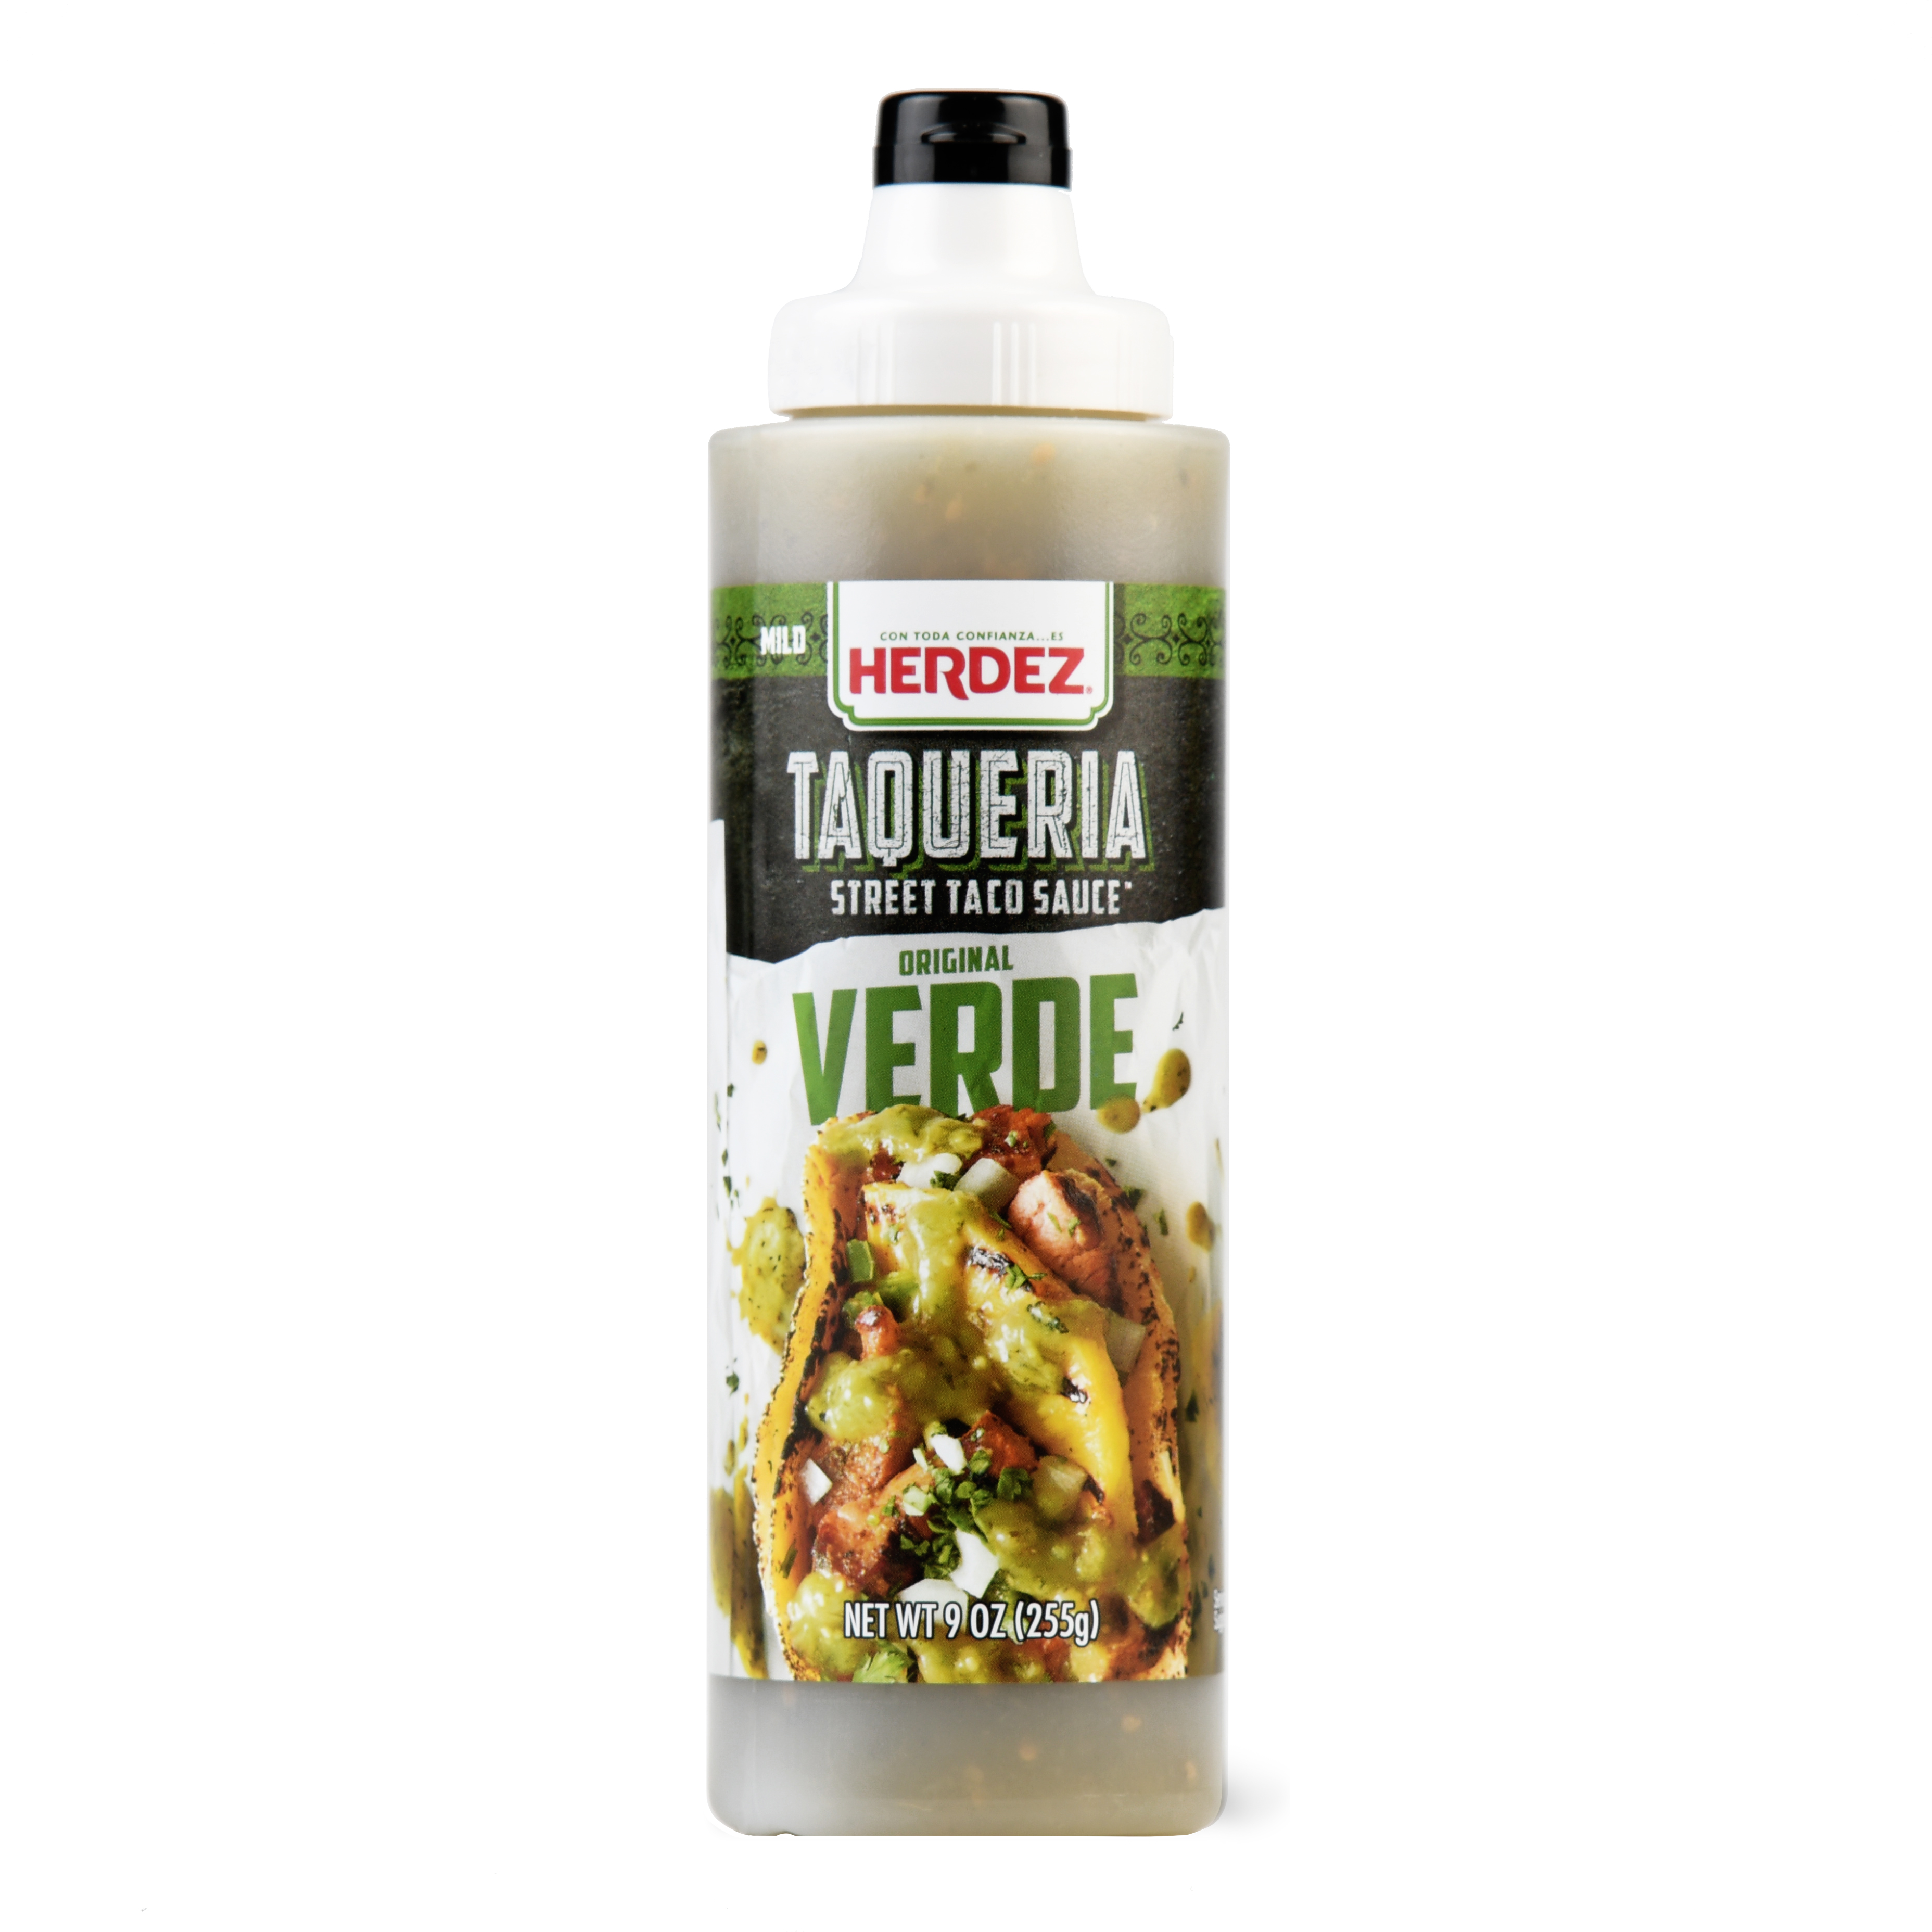 Herdez Taqueria Street Sauce Original Verde, 9 Ounce